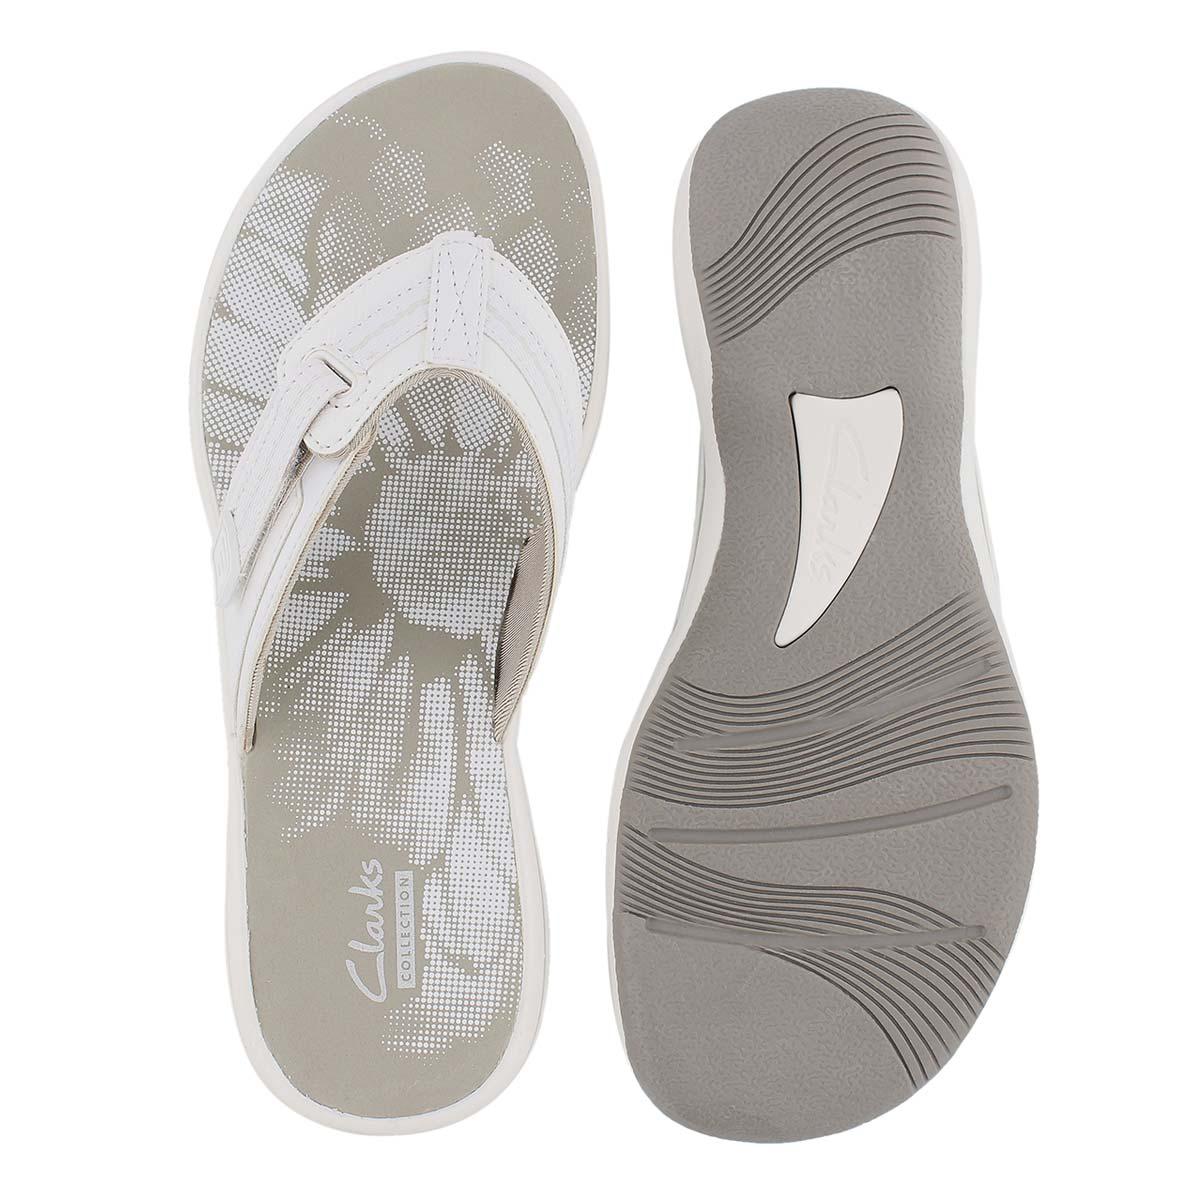 Lds Brinkley Jazz white thong sandal